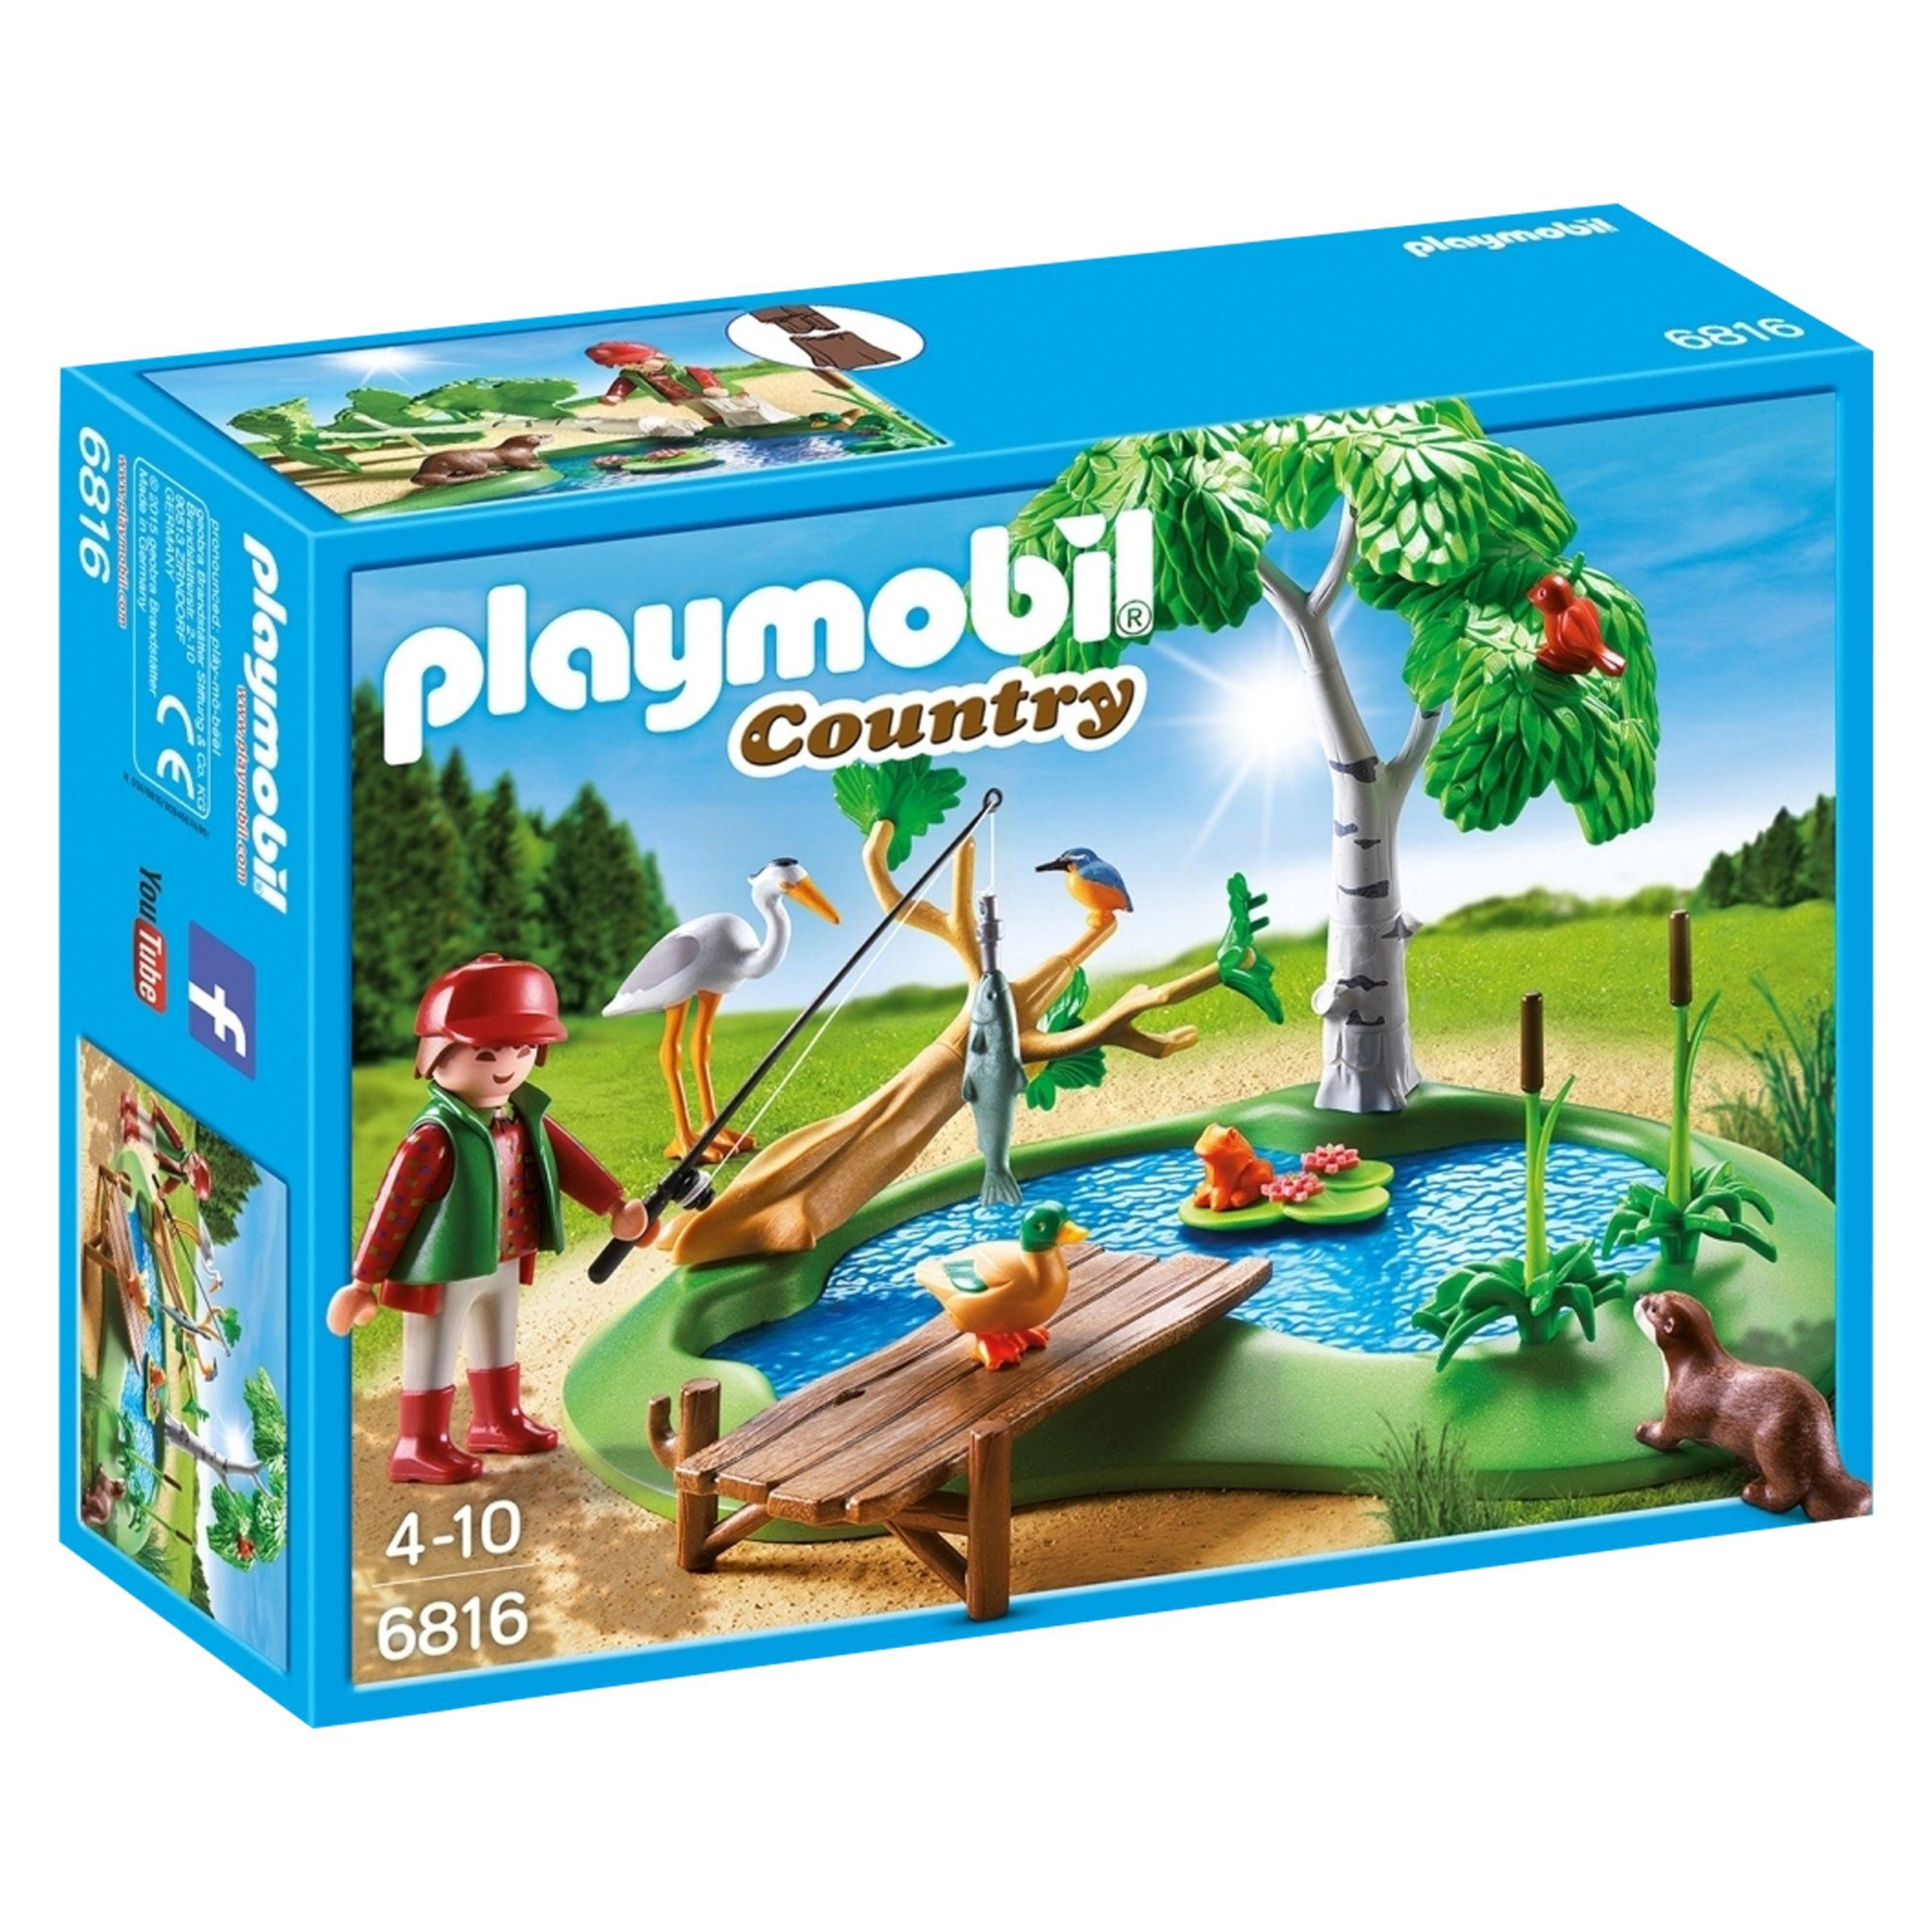 PLAYMOBIL Playmobil Country Fishing Pond